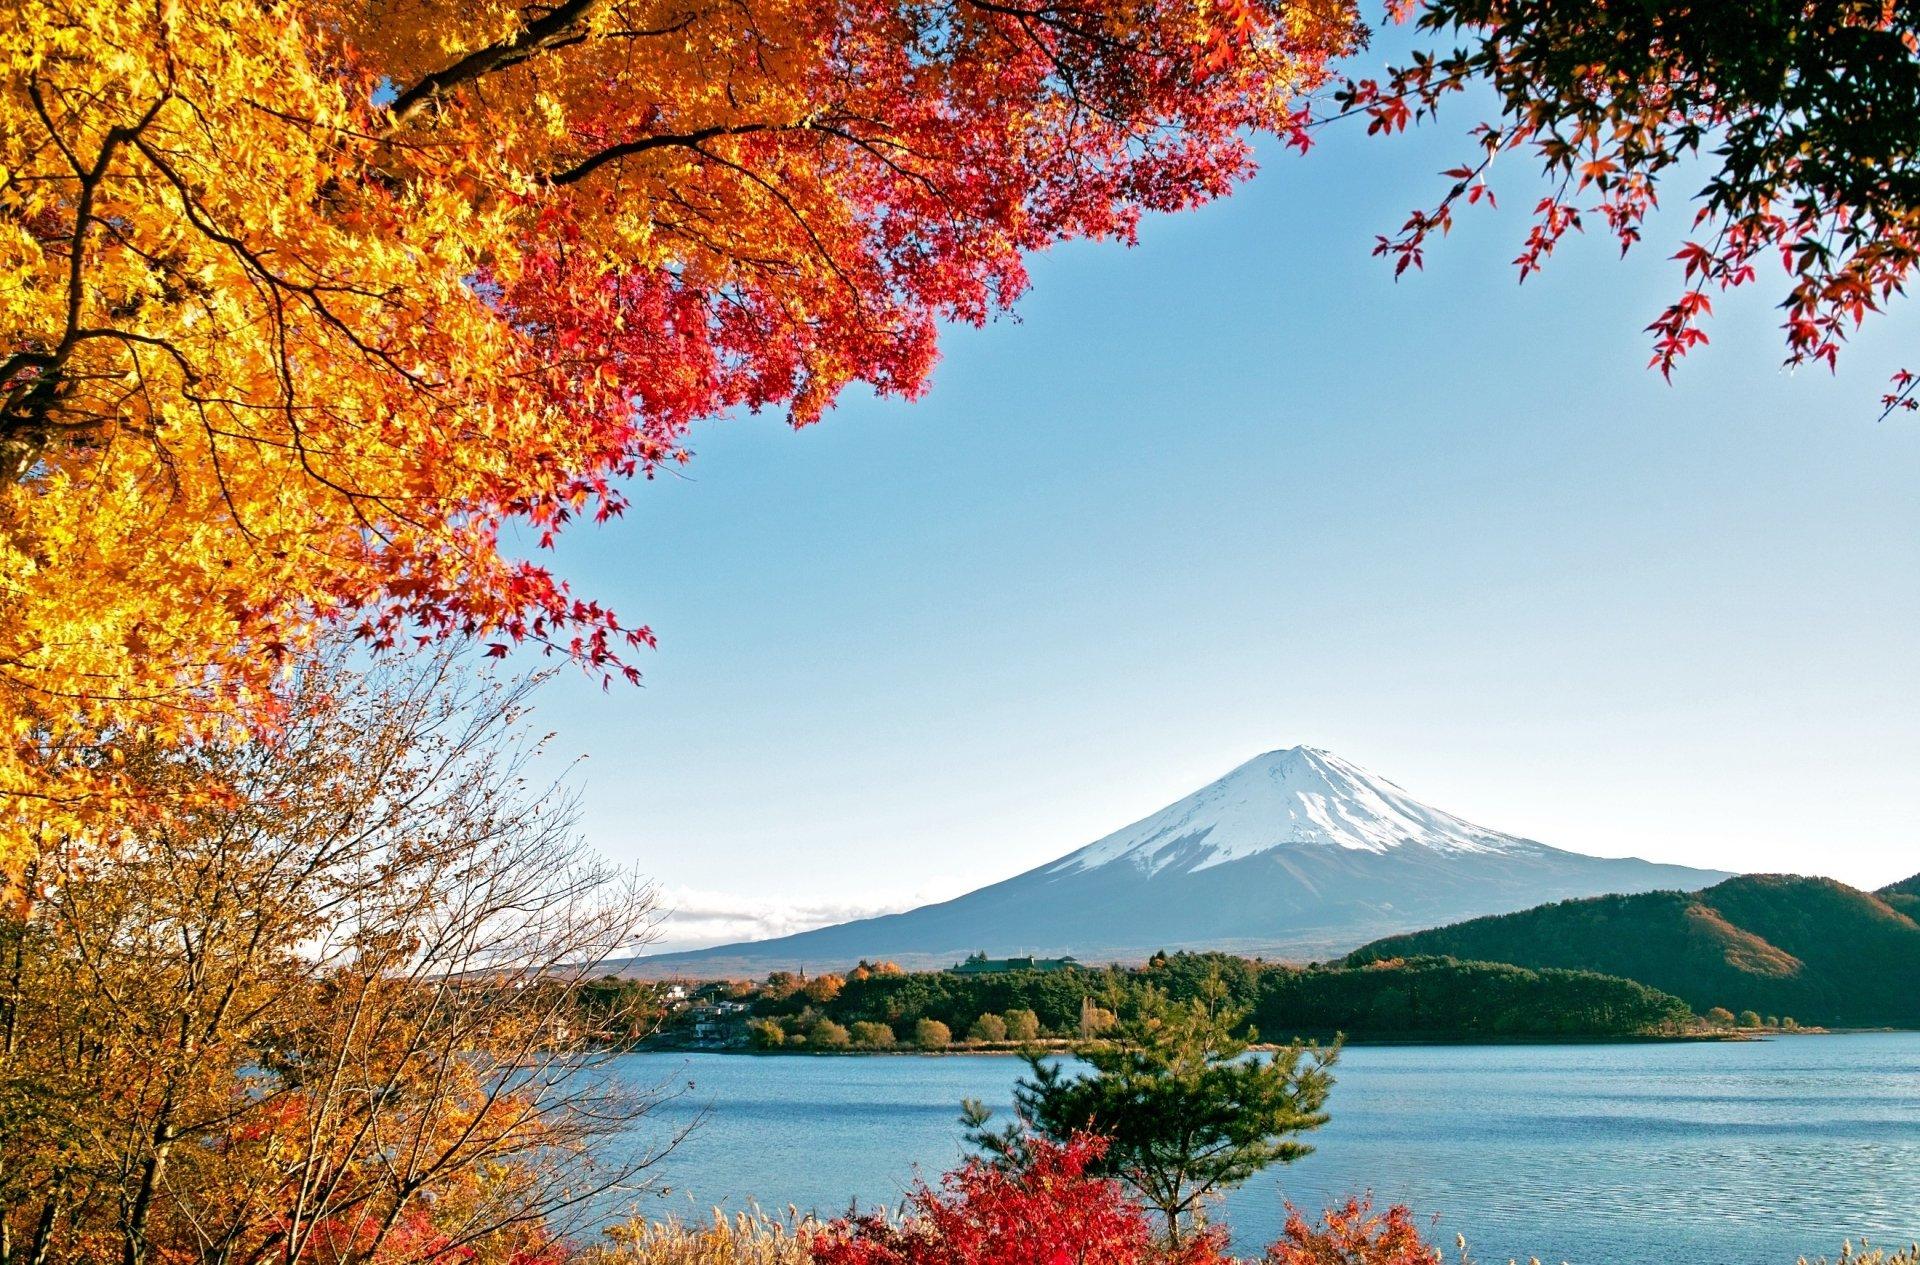 Fall Iphone 5 Wallpaper Hd Mont Fuji Full Hd Fond D 233 Cran And Arri 232 Re Plan